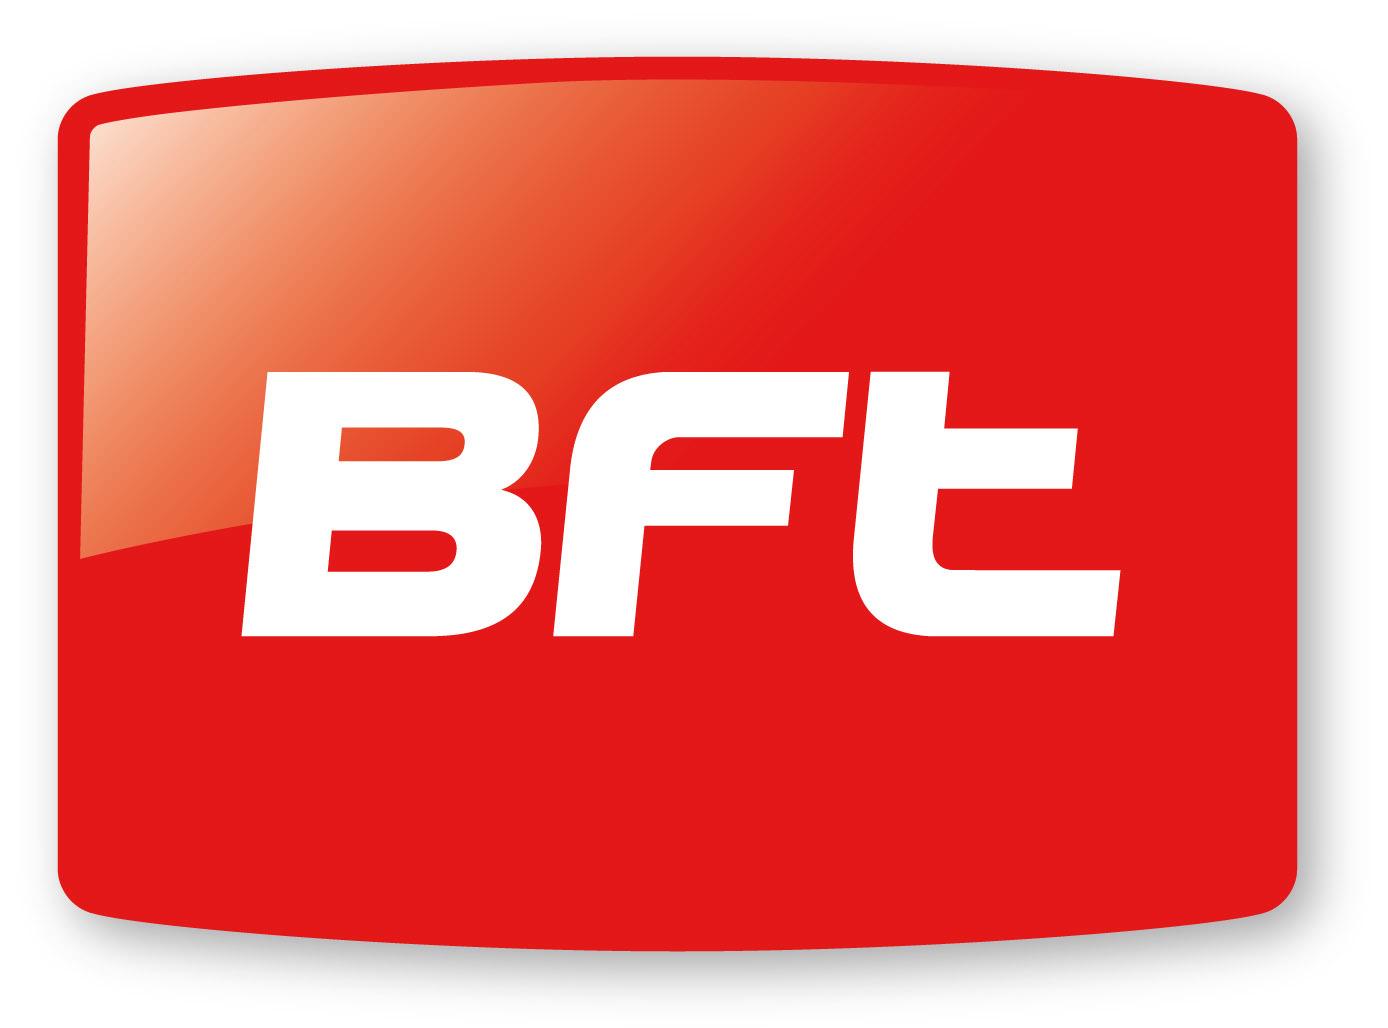 Акция! Скидка 10% на все оборудование бренда BFT*